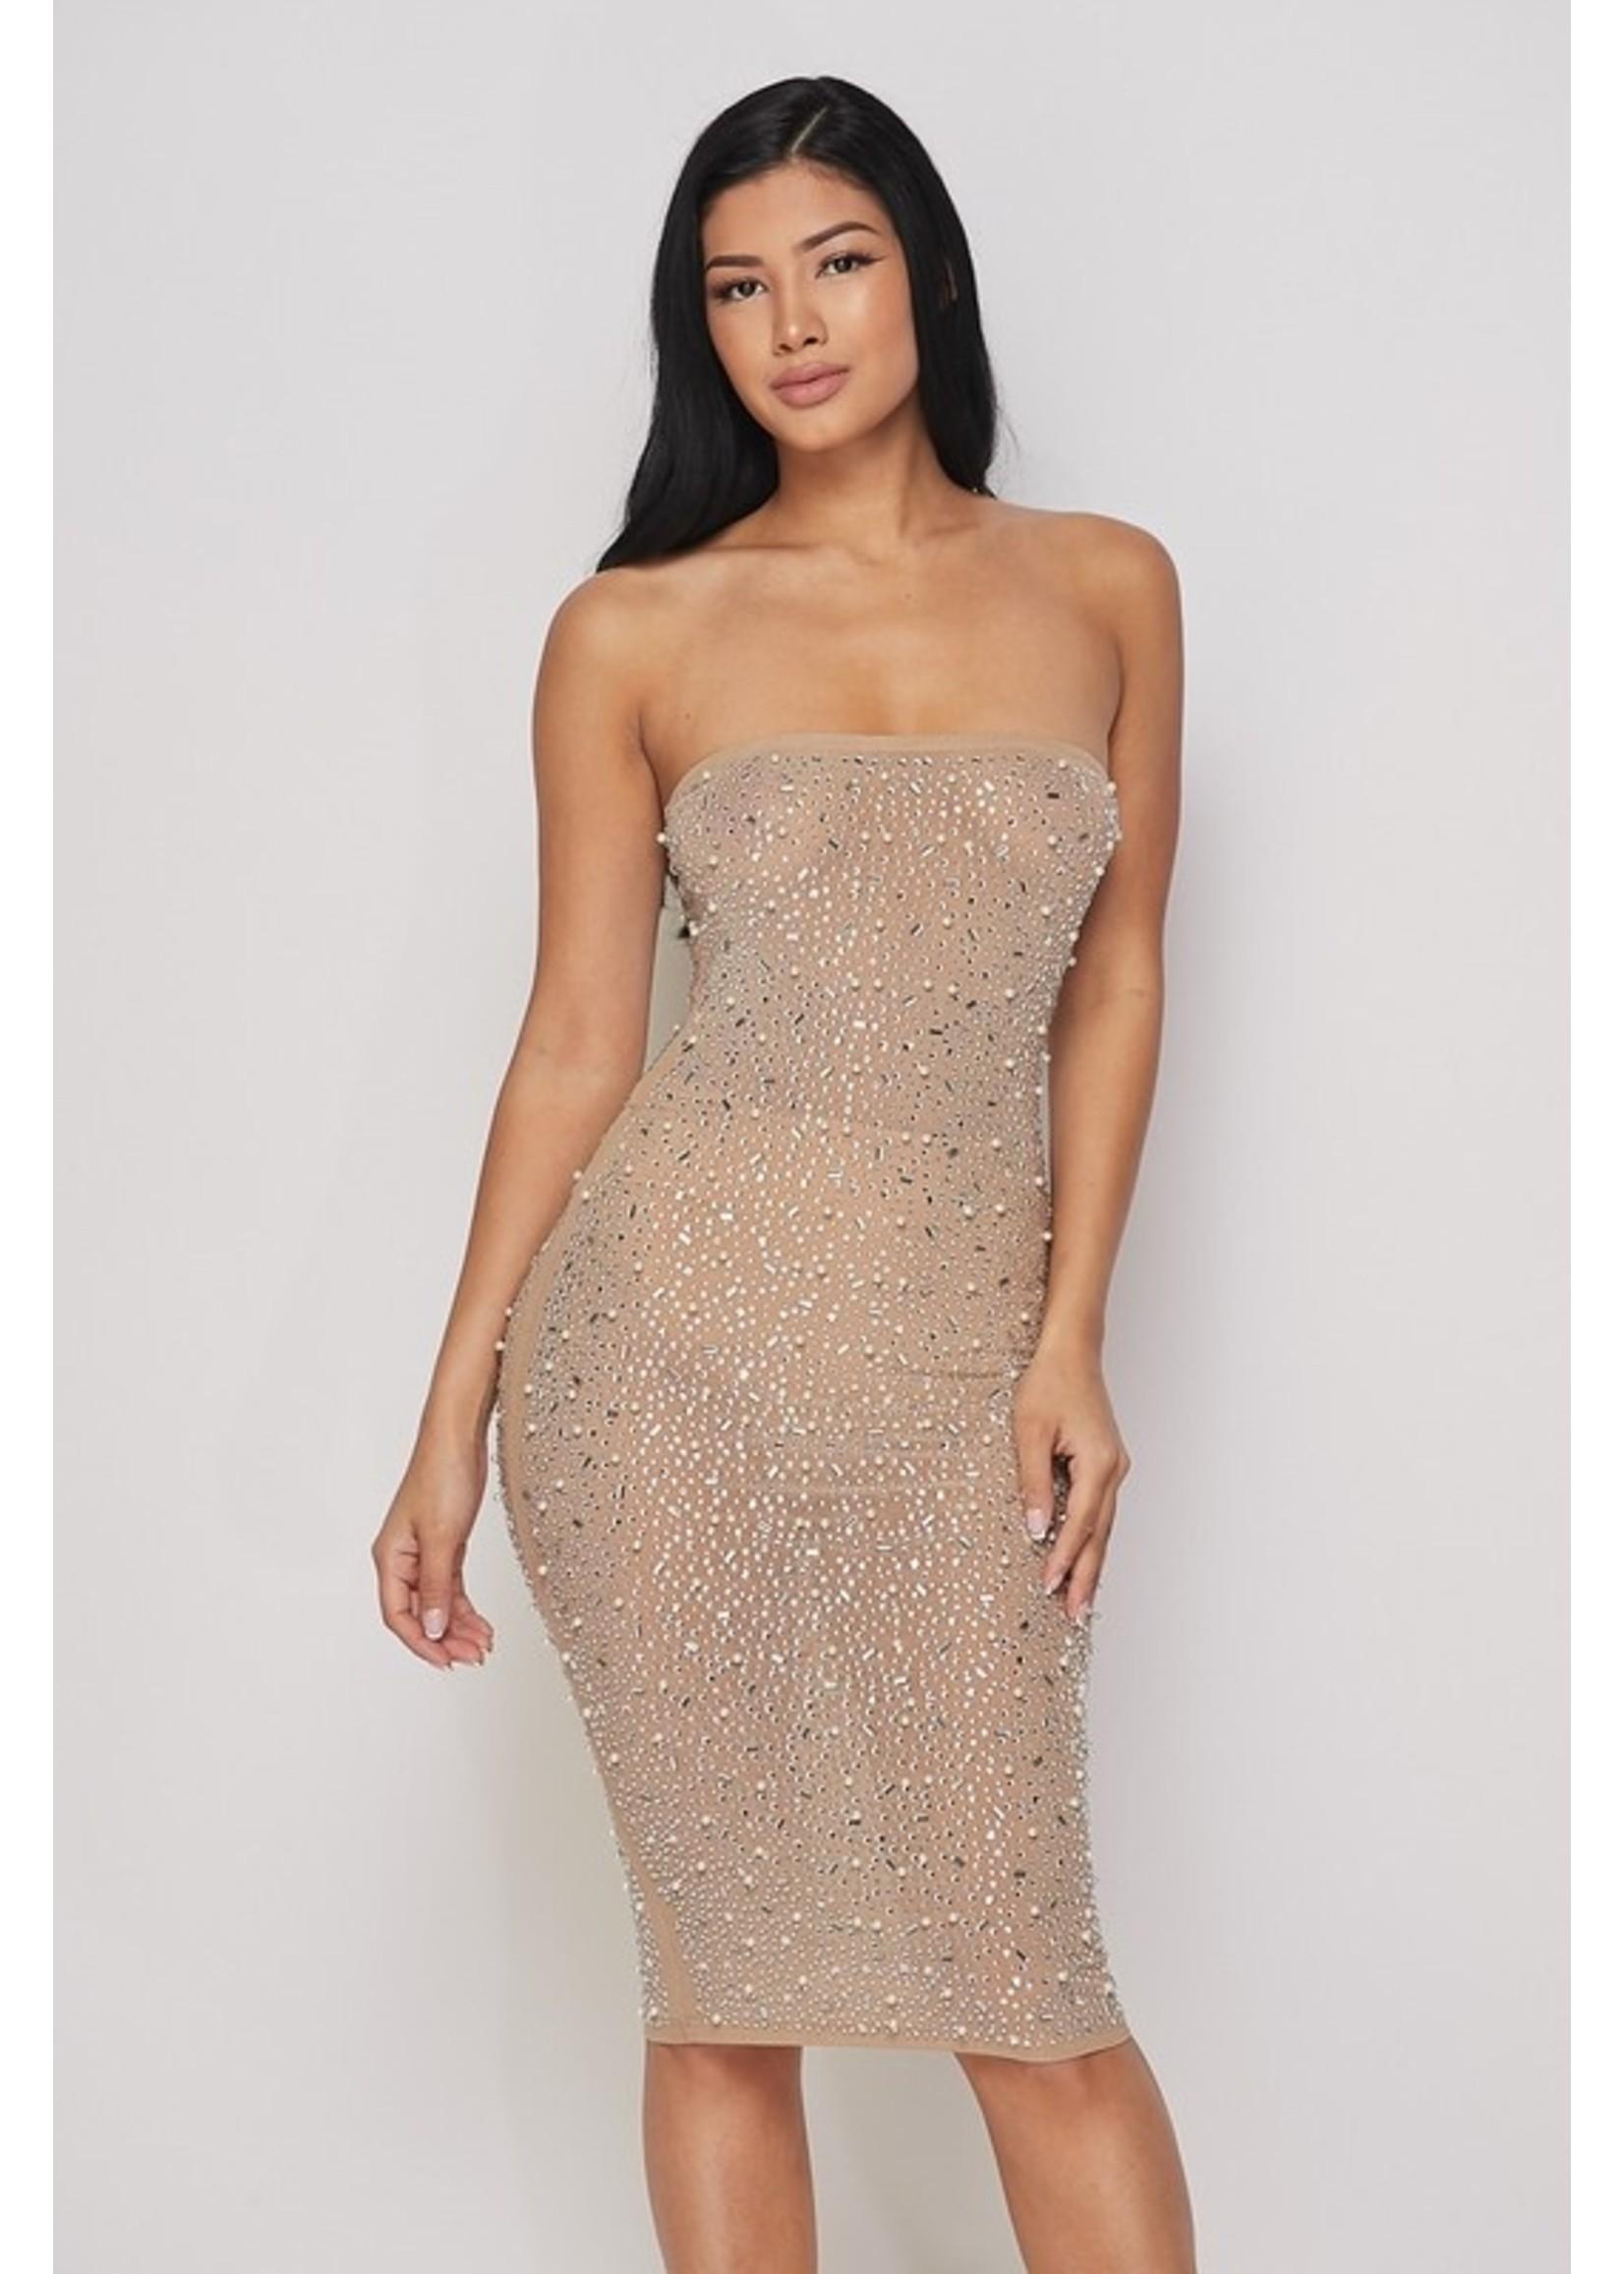 Banjul Harmoni Dress Nude